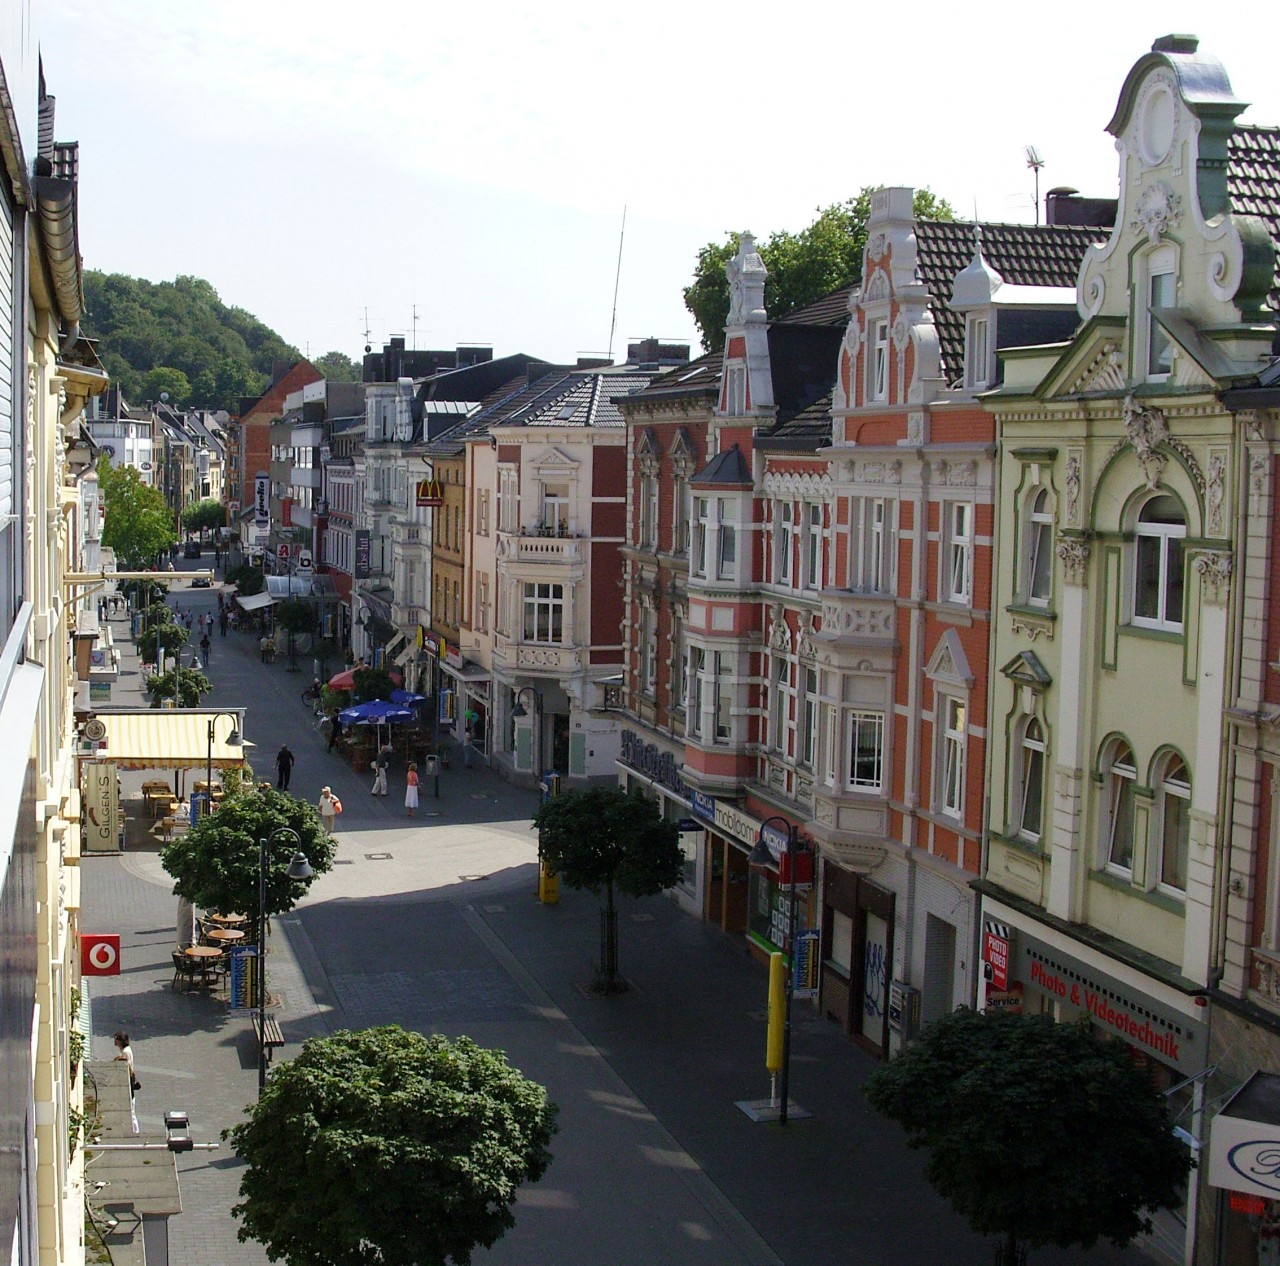 Siegburg Germania